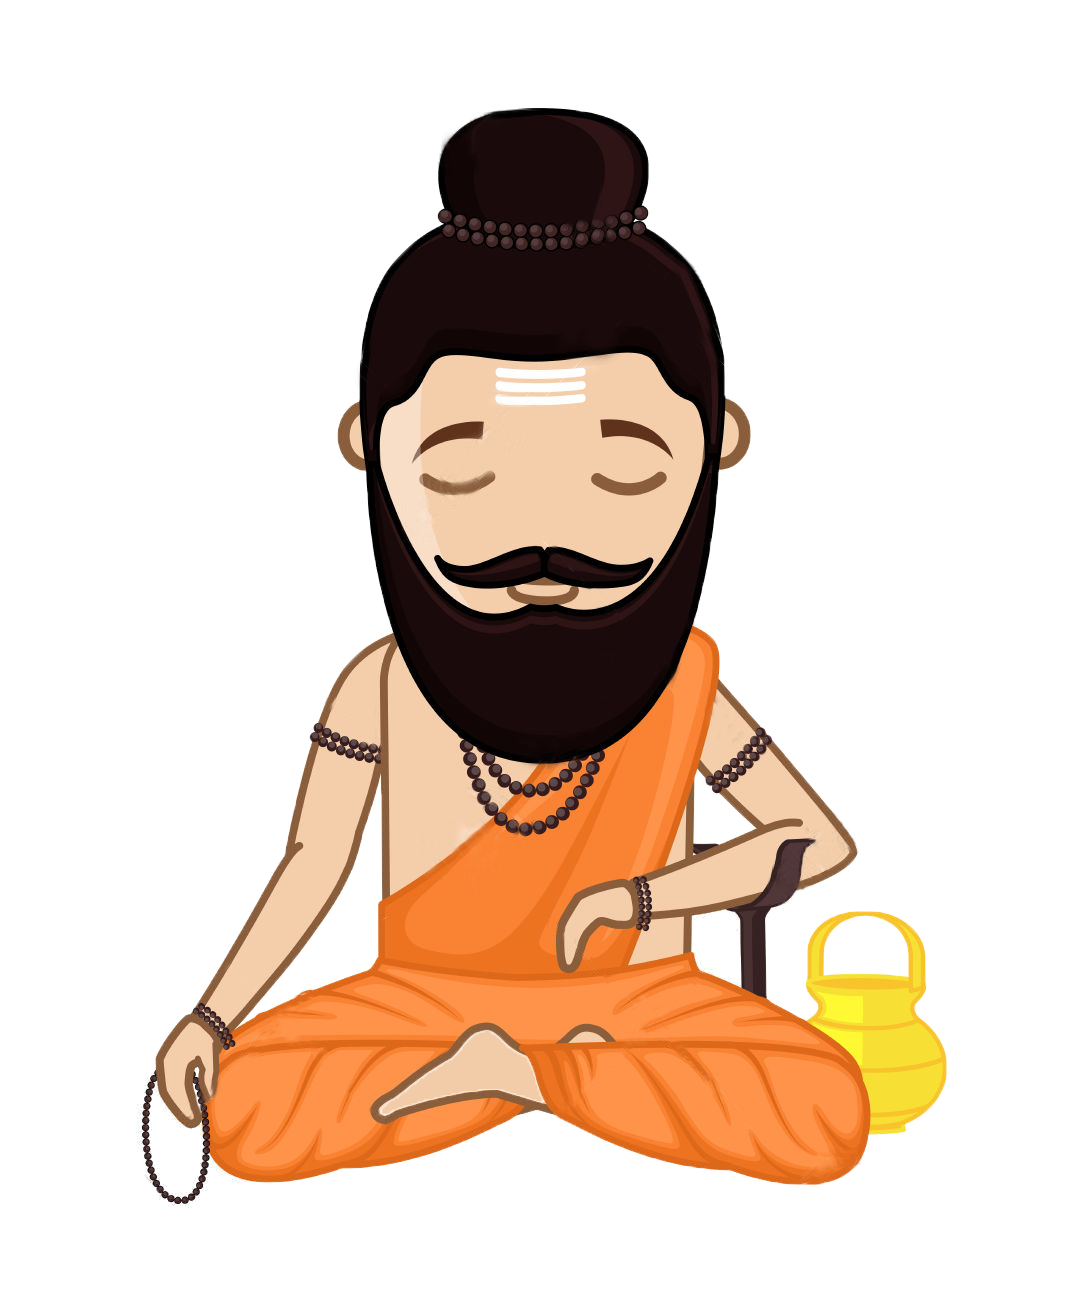 Imgur clipart banner royalty free library Meditation, Clipart, Hindu Saint, No watermark, High Resolution ... banner royalty free library